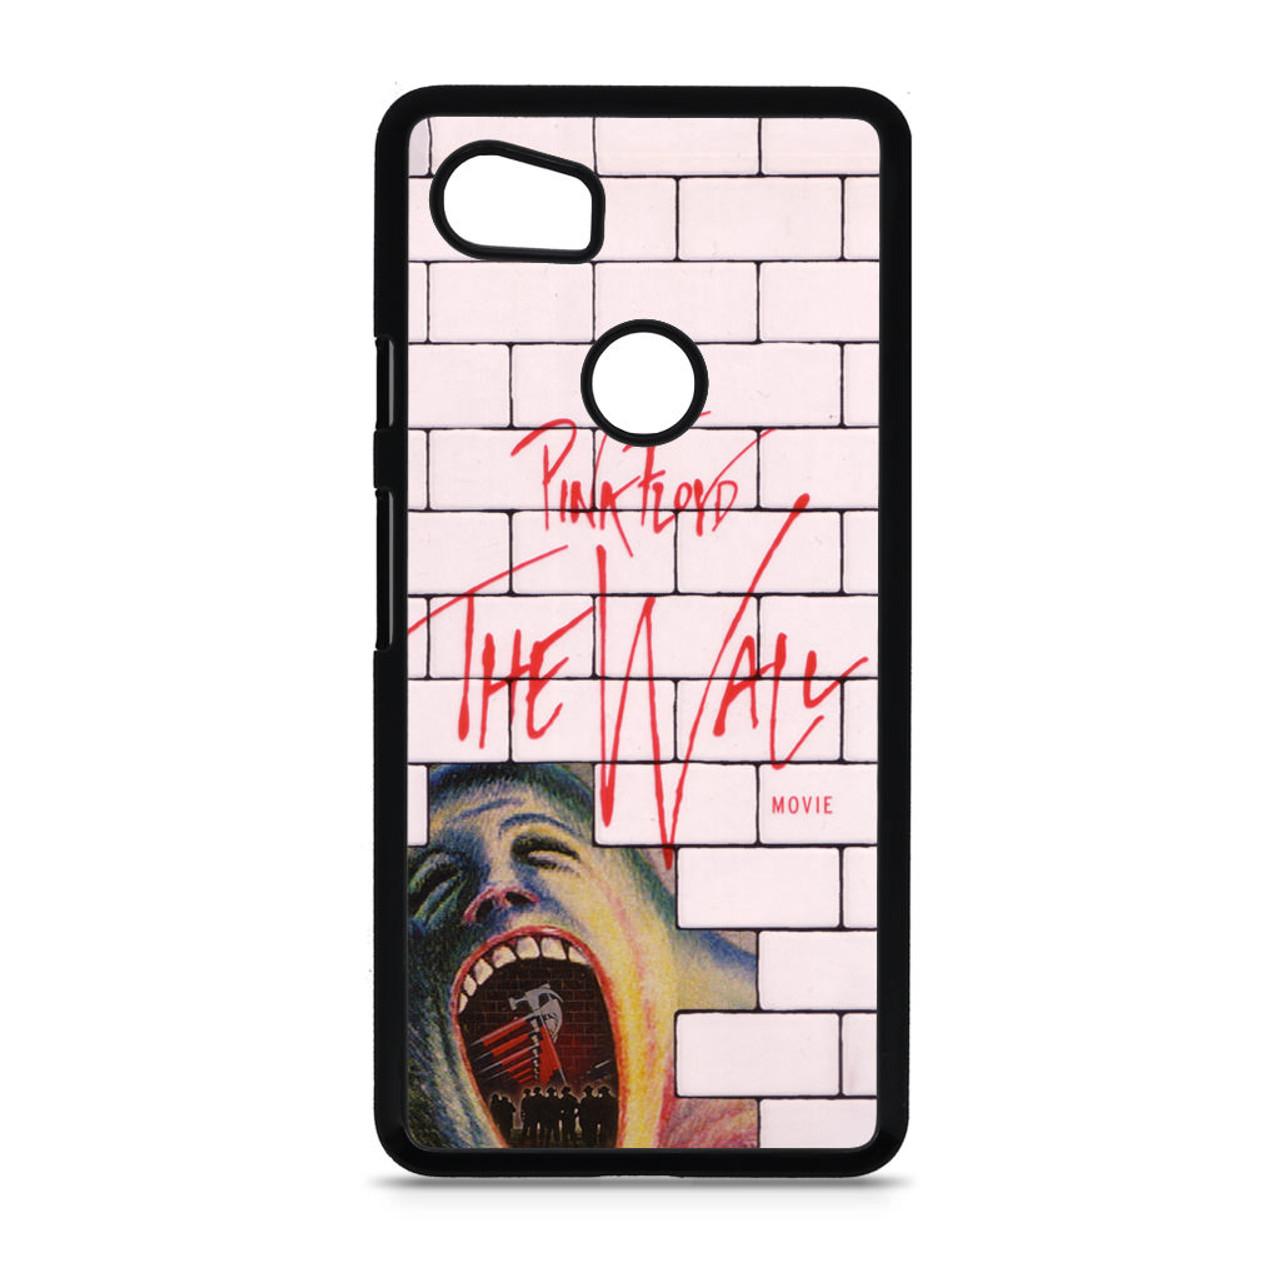 Pink Floyd The Wall Movie Google Pixel 2 XL Case